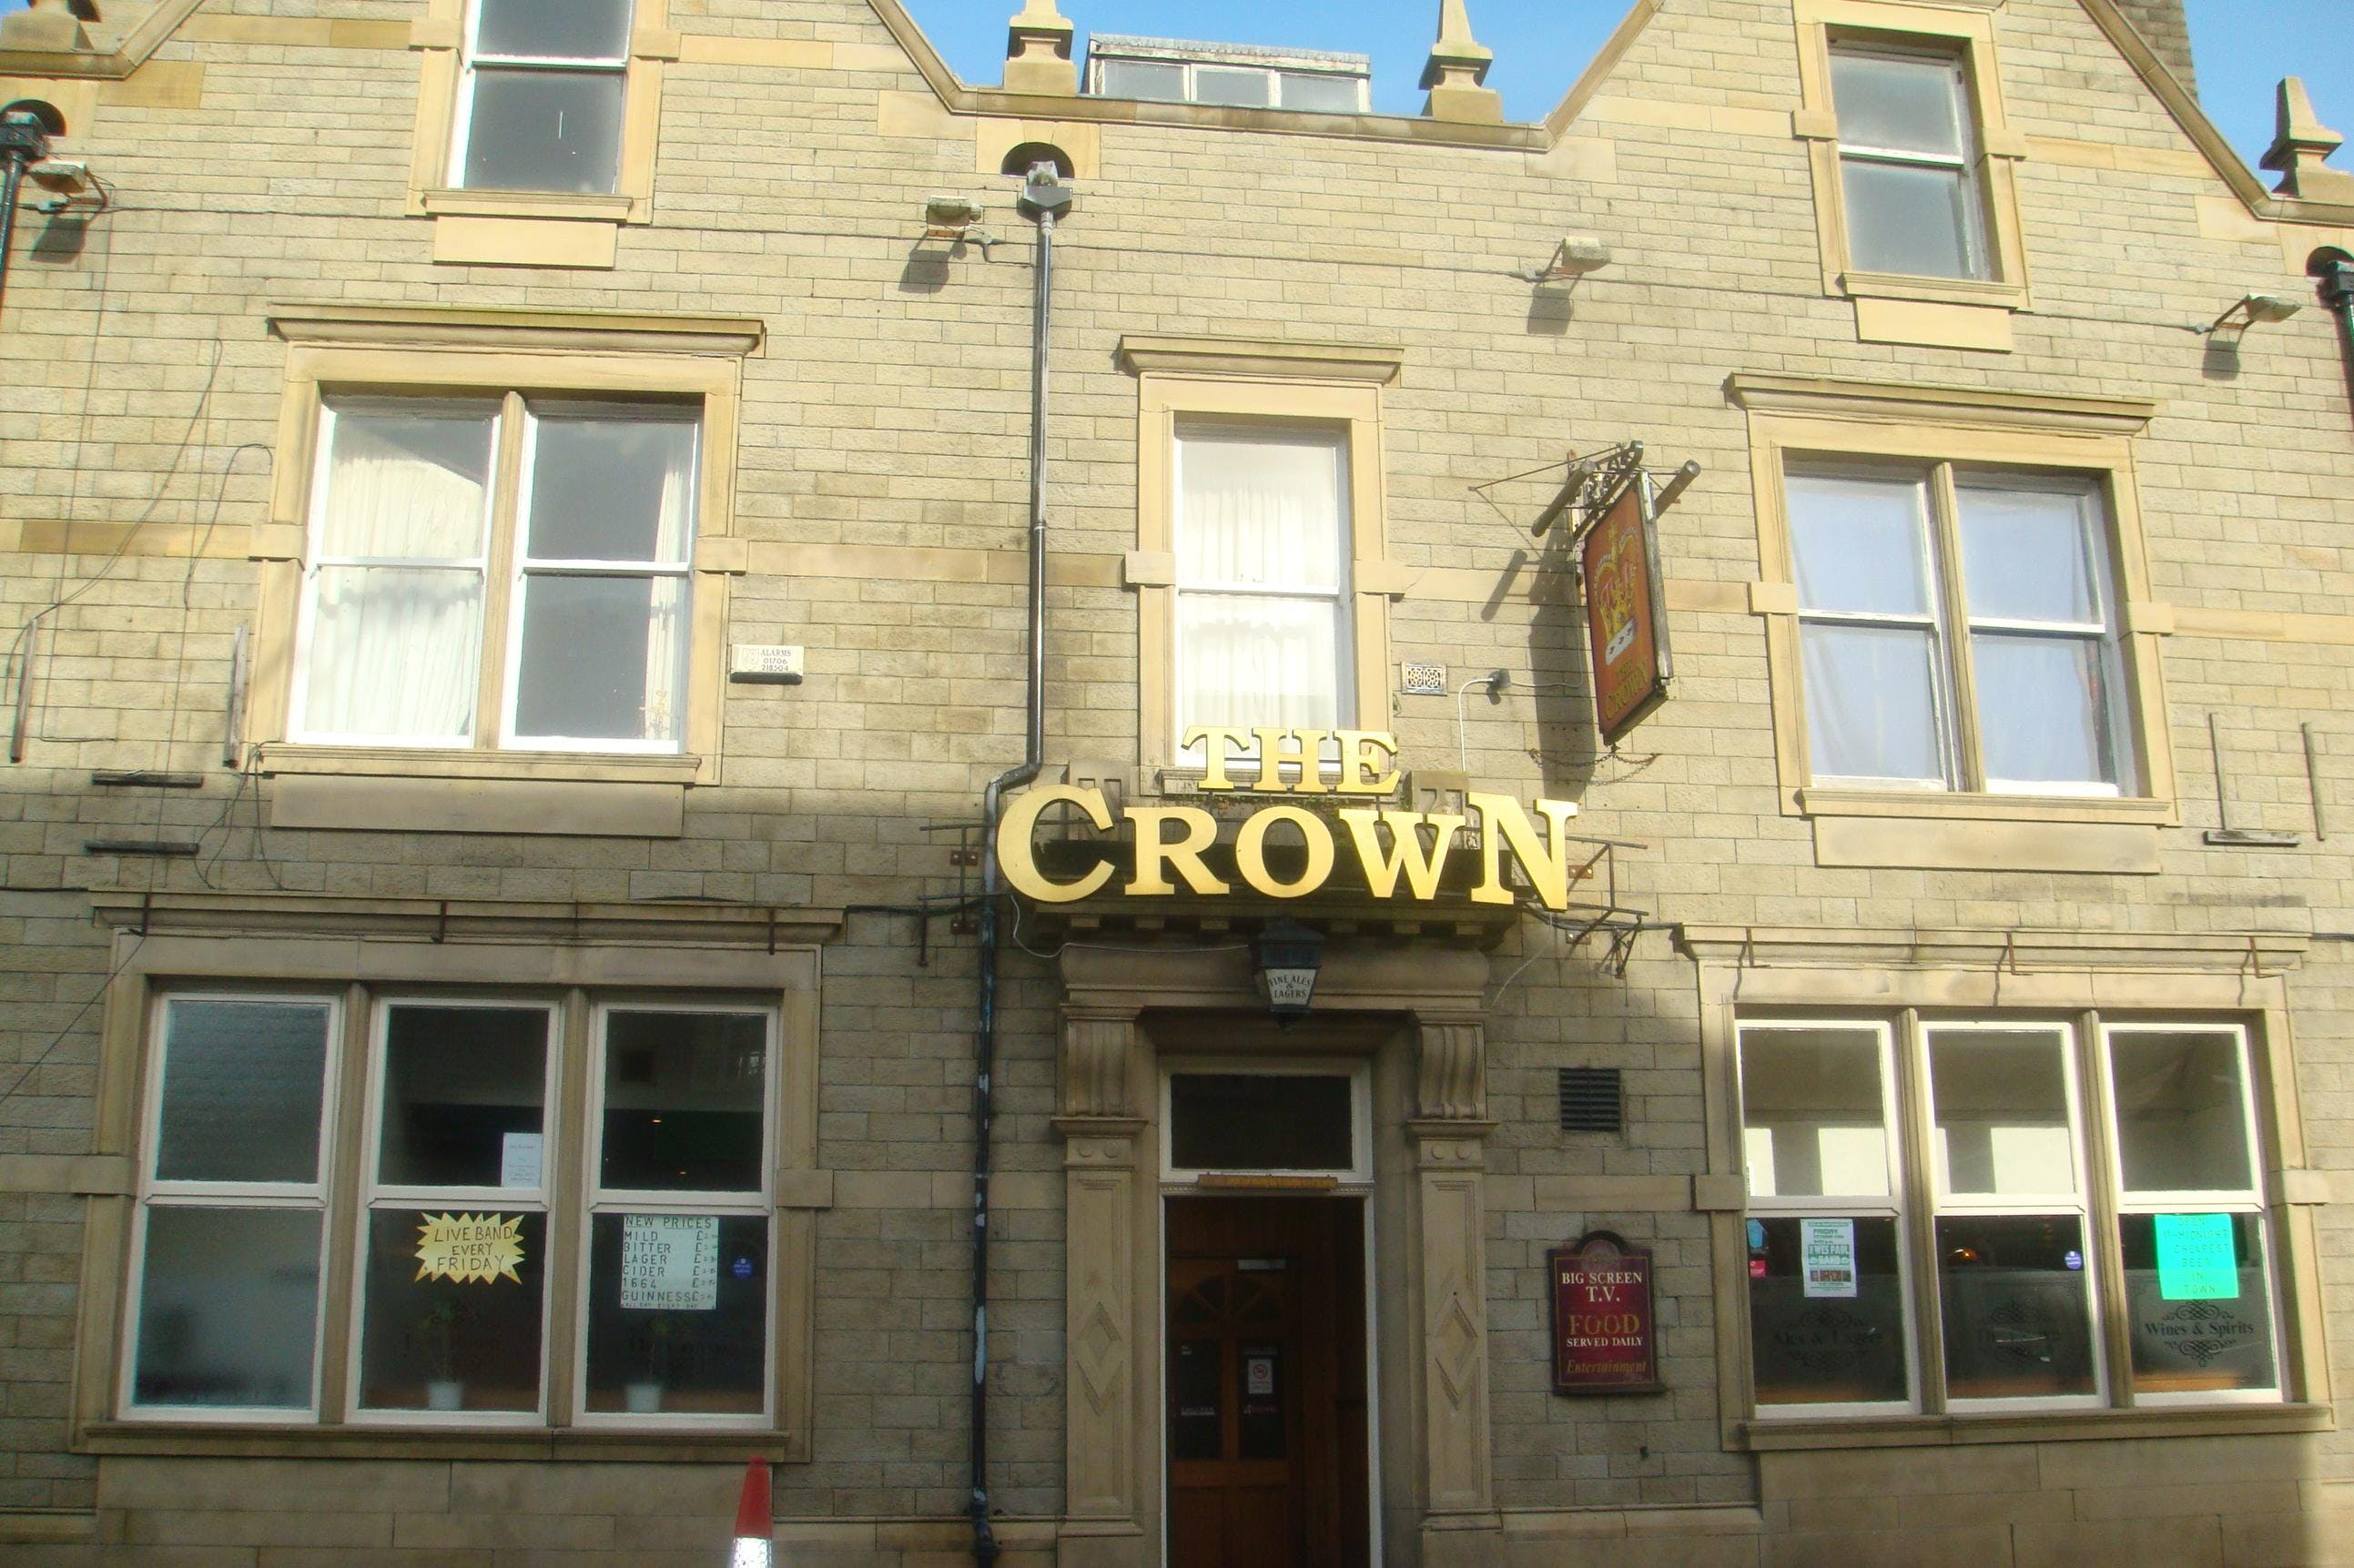 The Crown Hotel, Bacup Road, Rawtenstall, Leisure For Sale - DSC02303.JPG